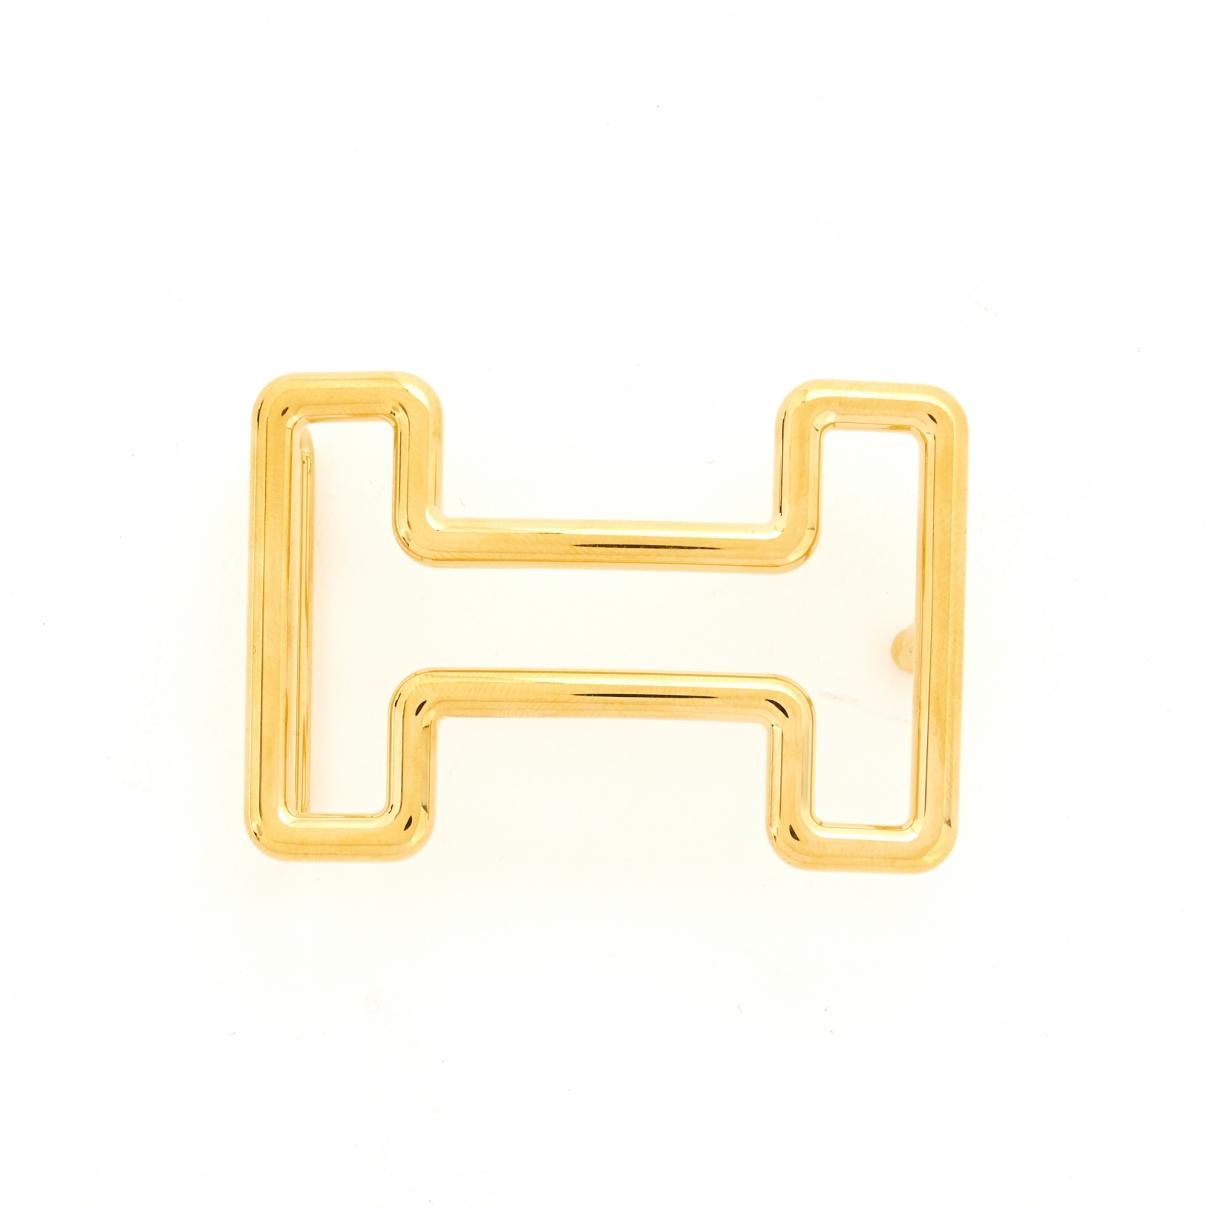 Hermes Boucle seule / Belt buckle Guertel in  Gold Metall